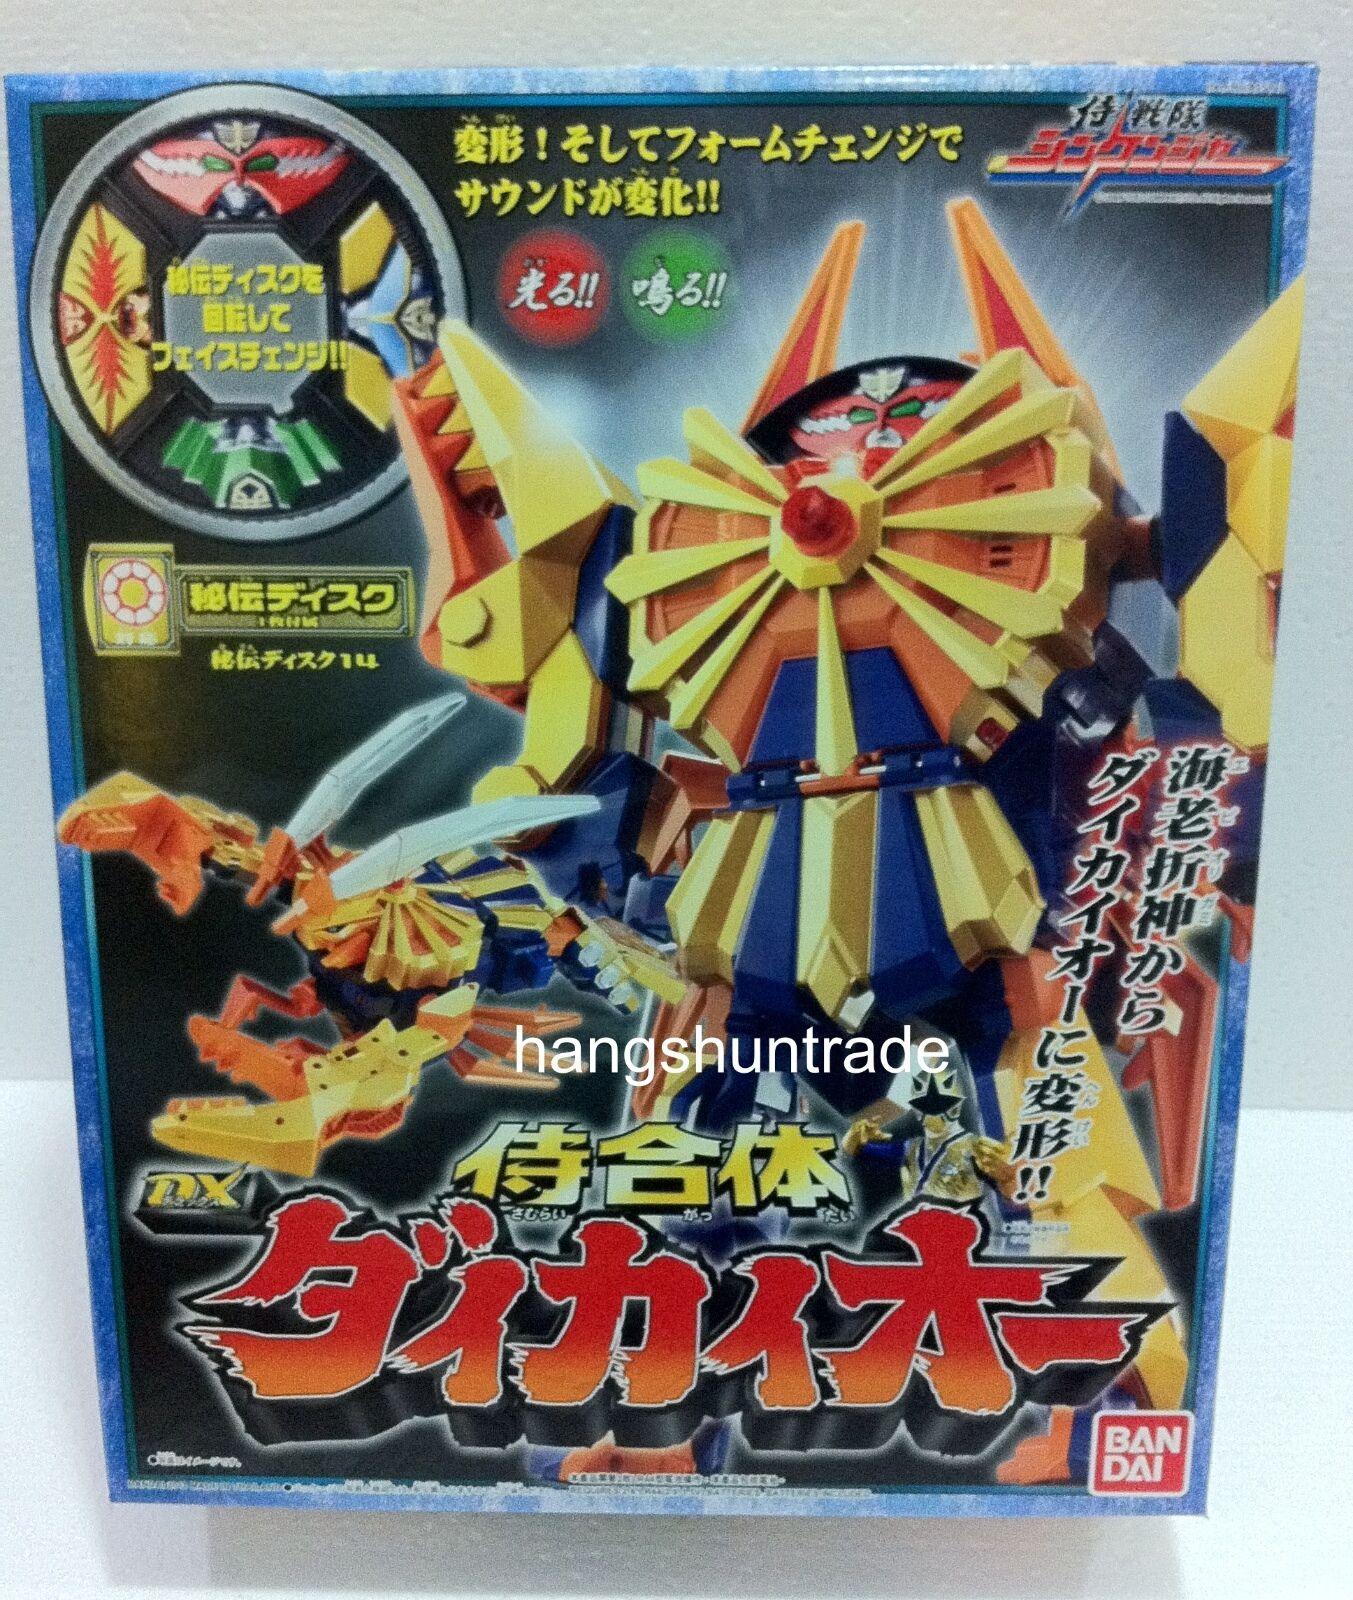 Bandai Shinkenger Power Rangers Samurai DX Daikaioh Claw Battlezord Figure